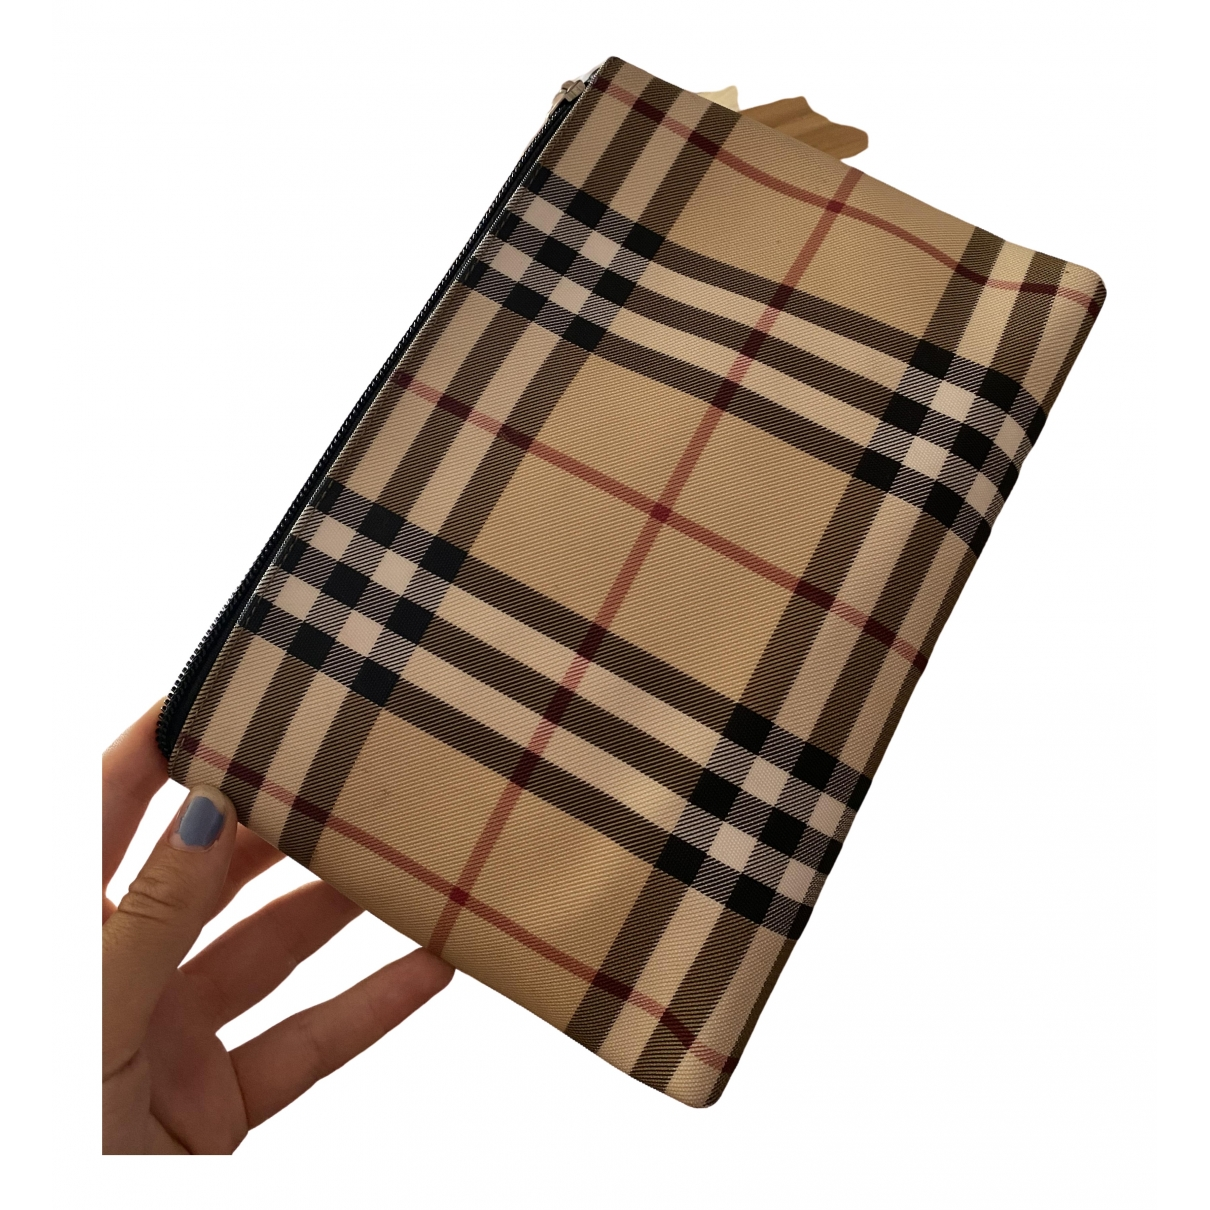 Burberry \N Beige Cloth Clutch bag for Women \N